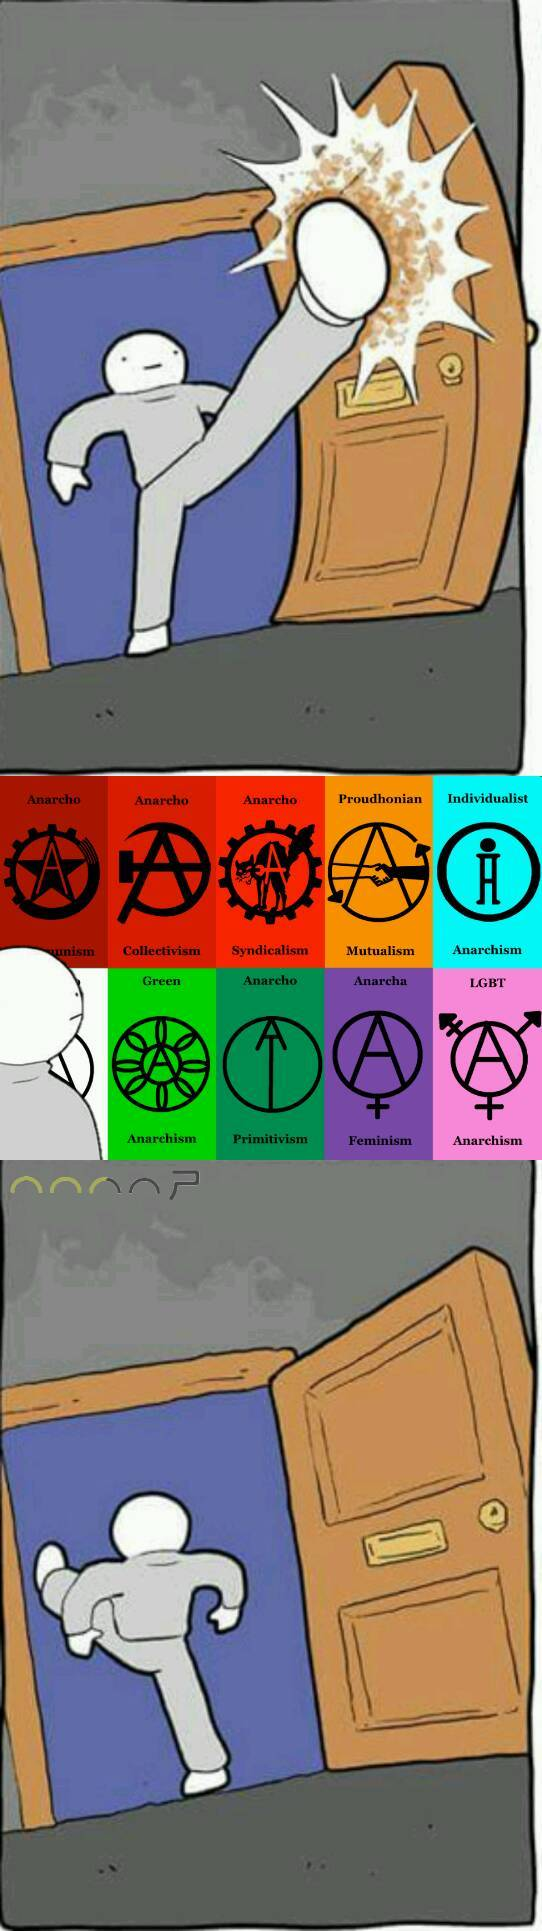 Anarcho-wtfism - meme